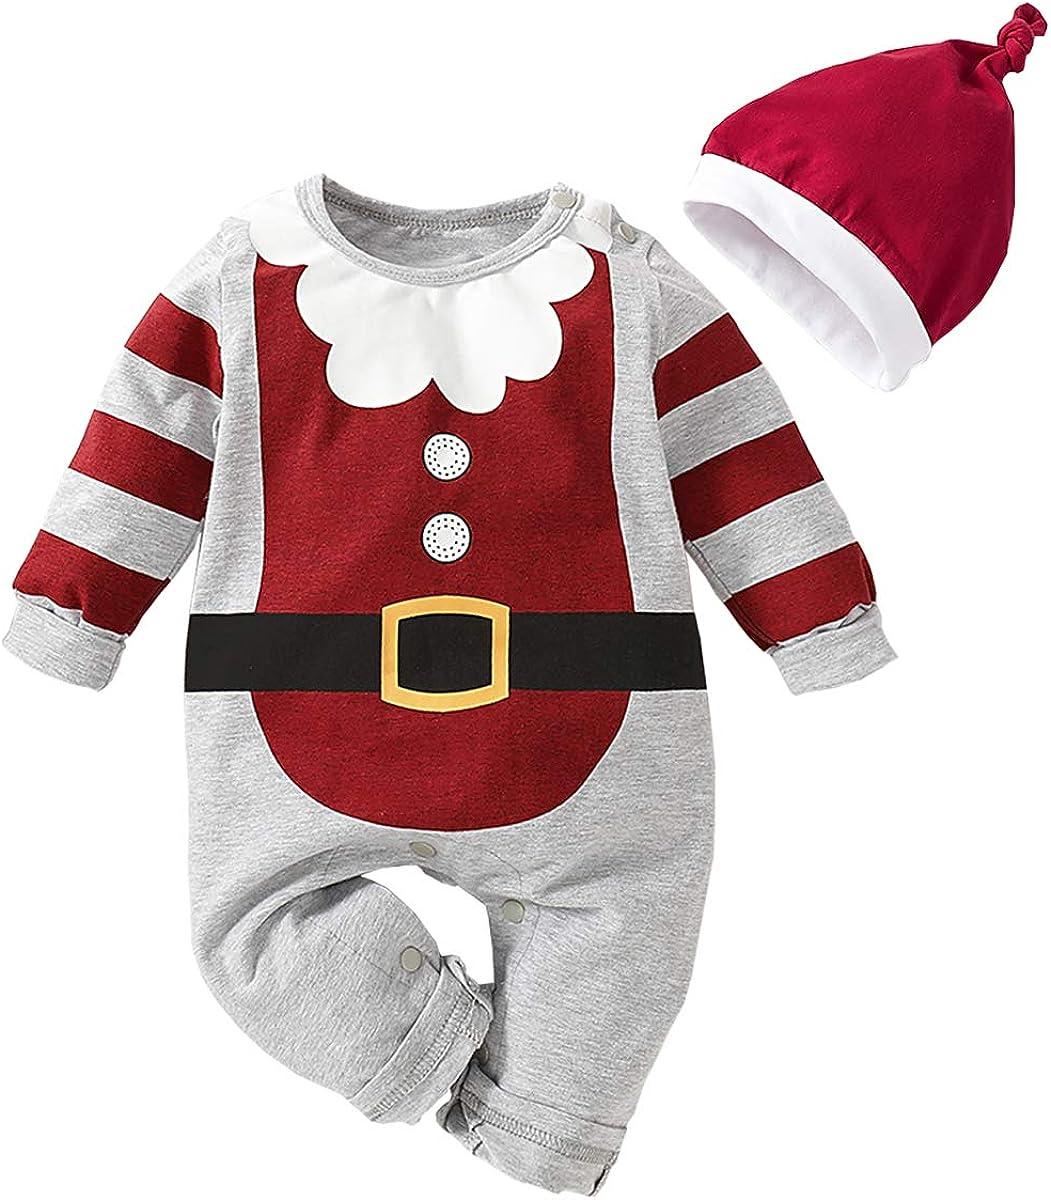 Newborn Baby Boys Bodysuit Short-Sleeve Onesie Santa Play with Snowman Print Jumpsuit Winter Pajamas